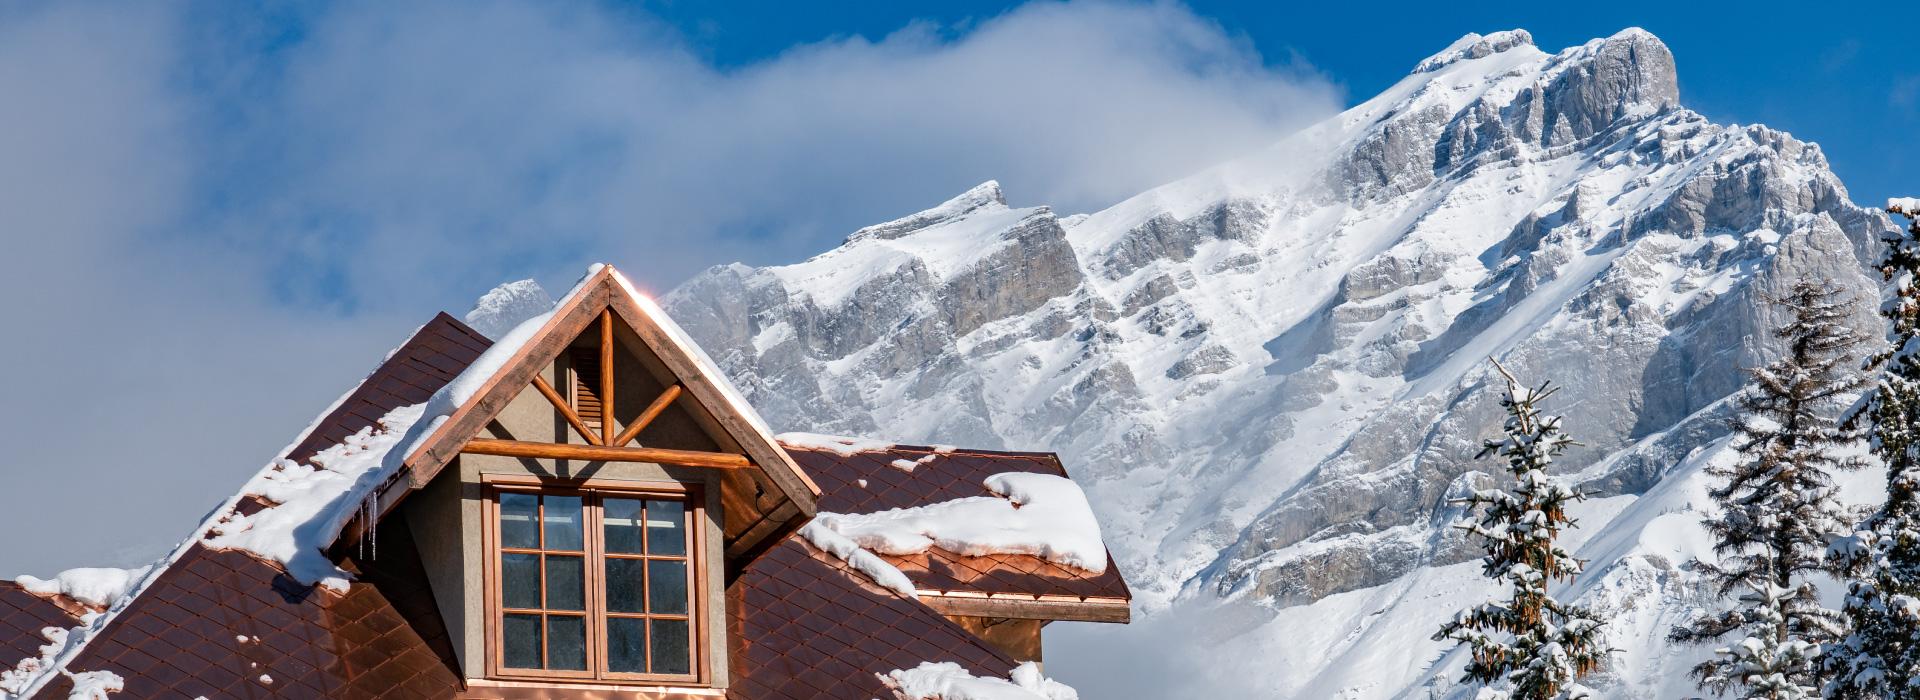 Banff Hotels Winter